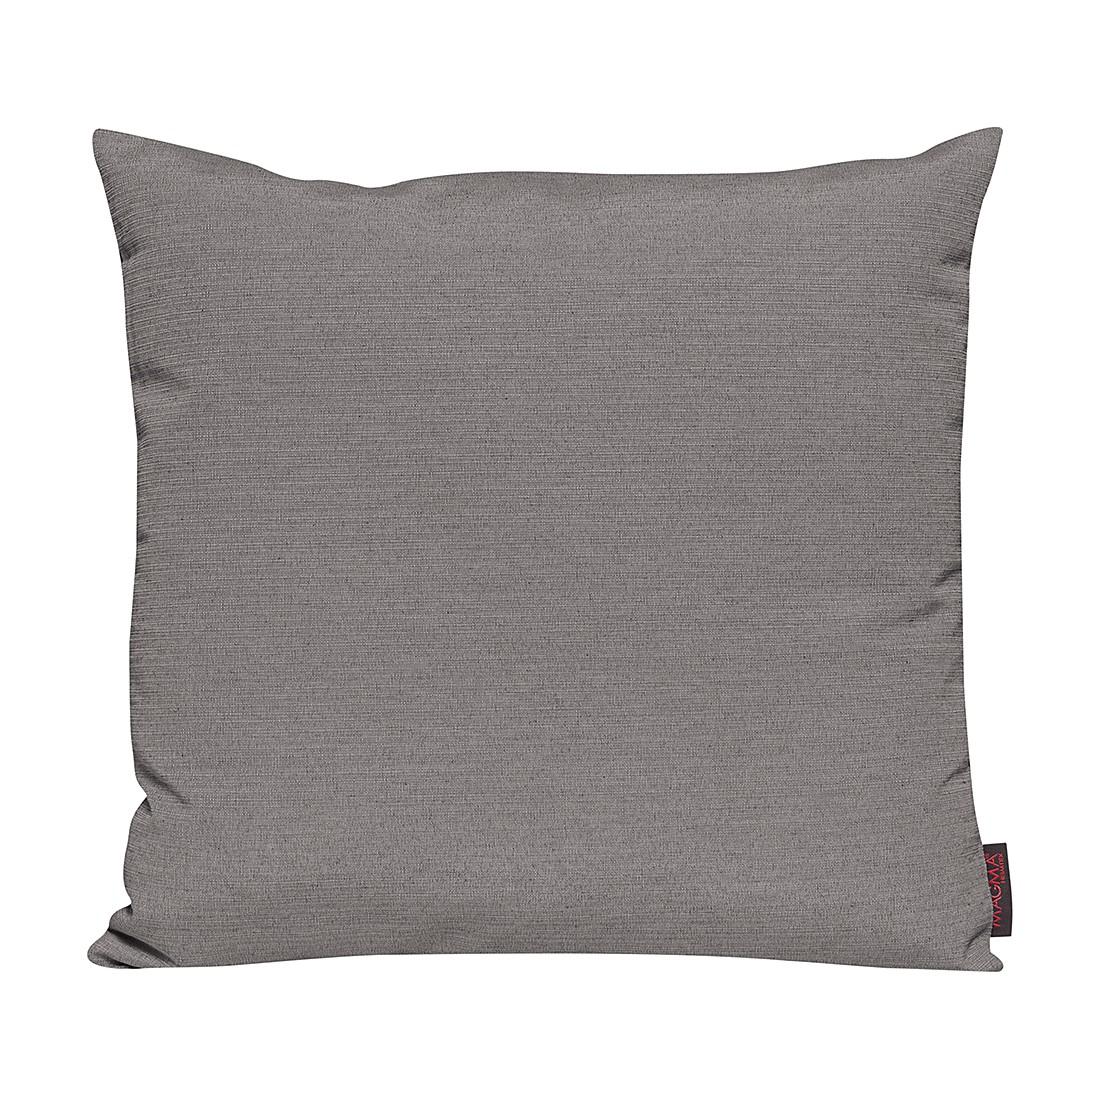 Kissenhülle Franca – Grau – 50 x 50 cm, Magma-Heimtex günstig kaufen